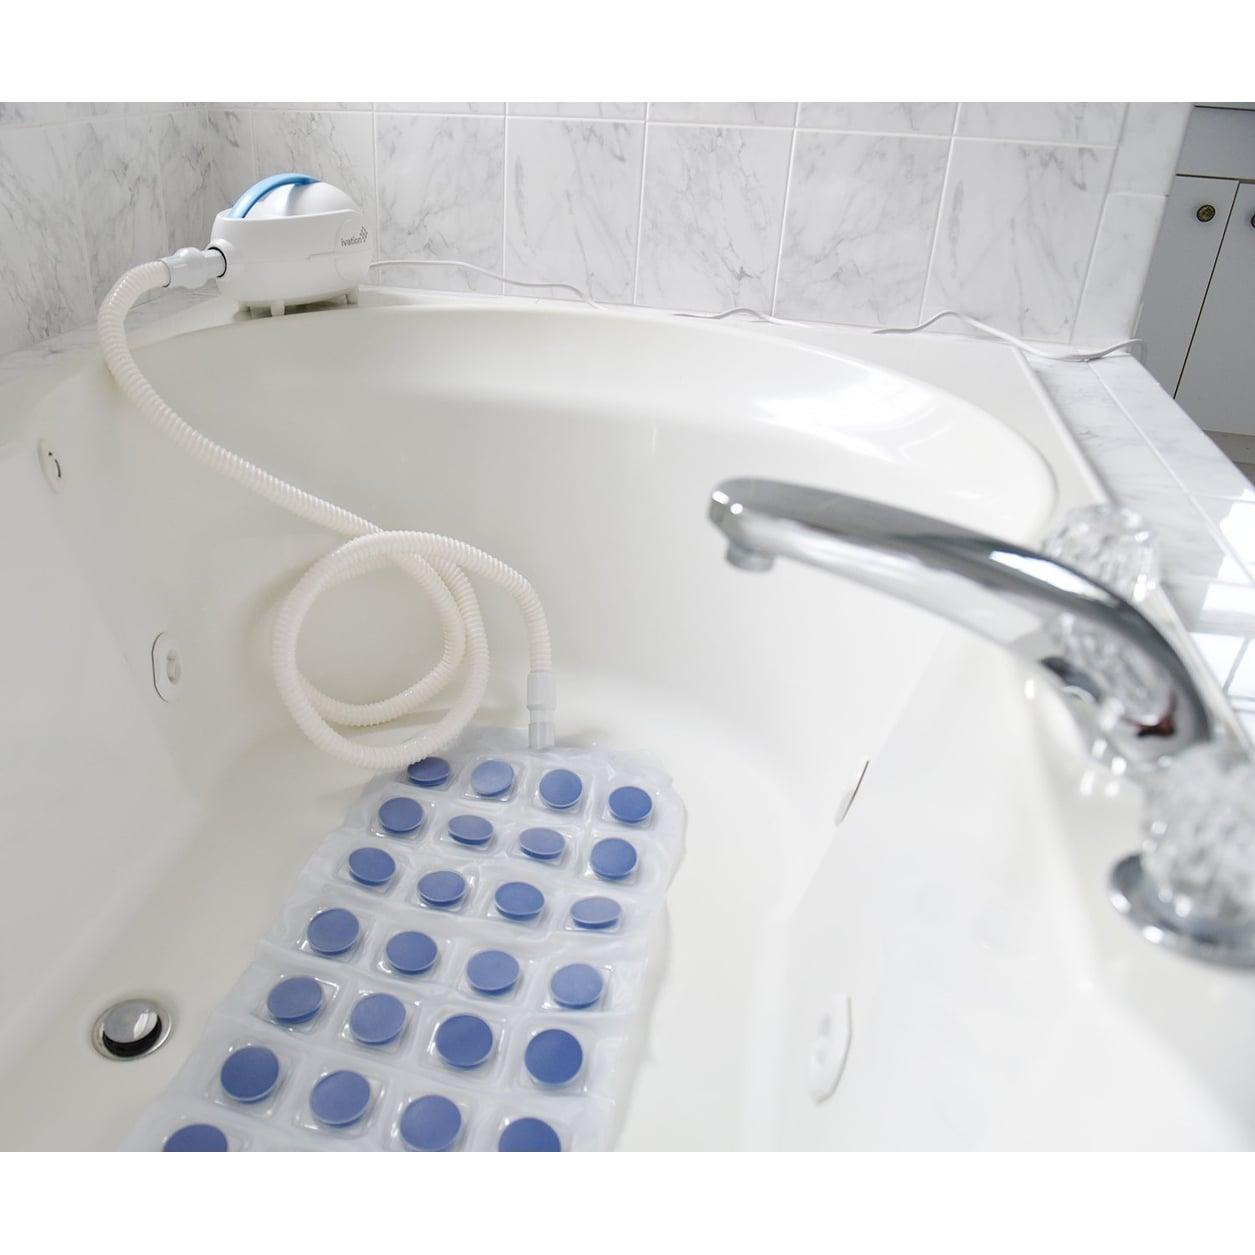 Shop Ivation Waterproof Bubble Bath Tub Body Spa Massage - Mat with ...